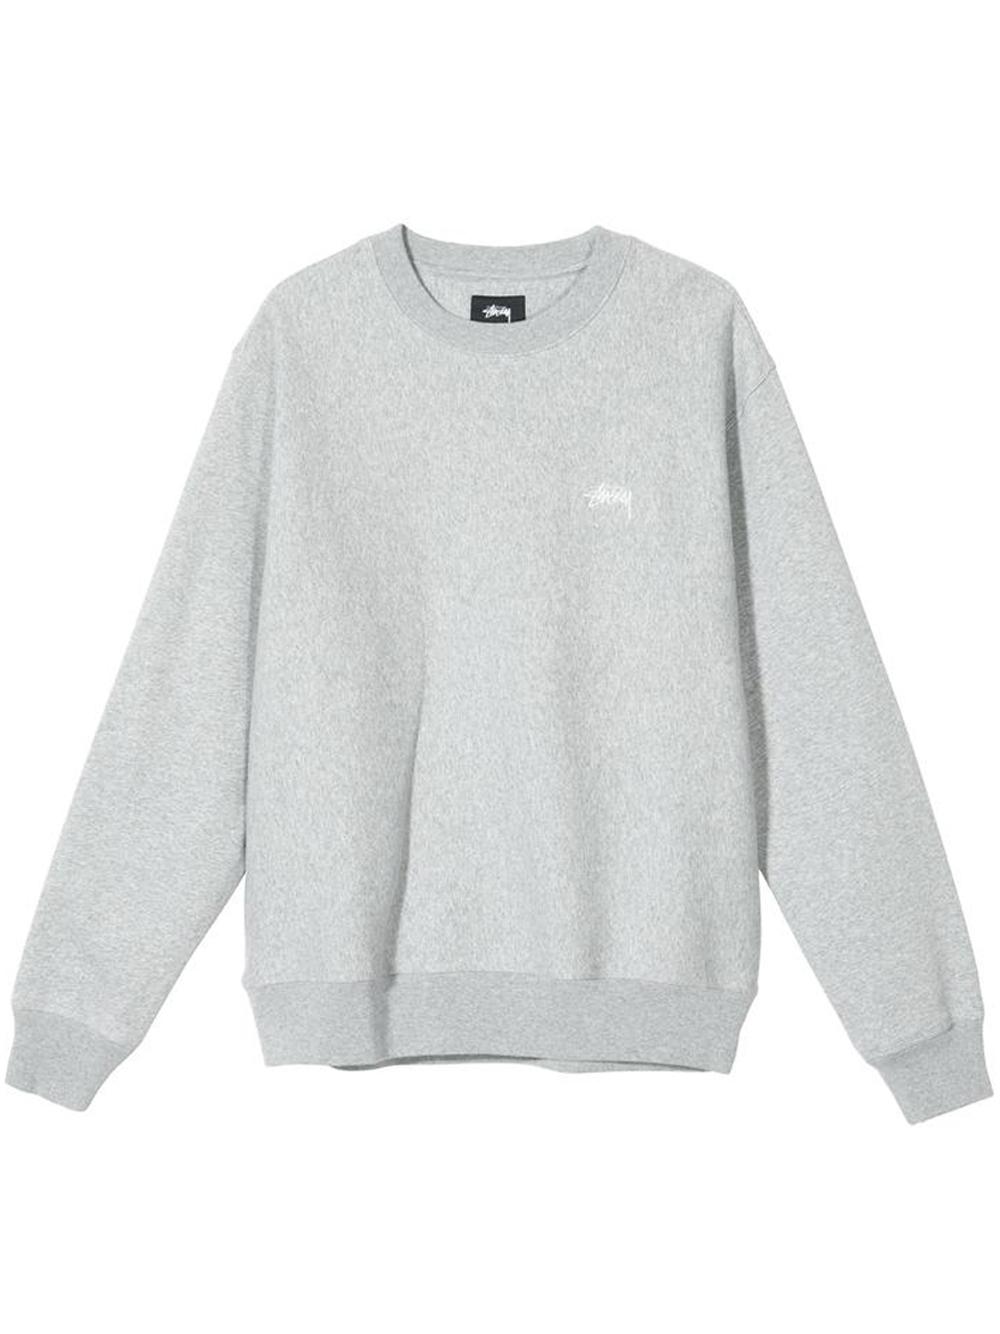 stock logo crew man gray in cotton STUSSY | Sweatshirts | 118416GREY